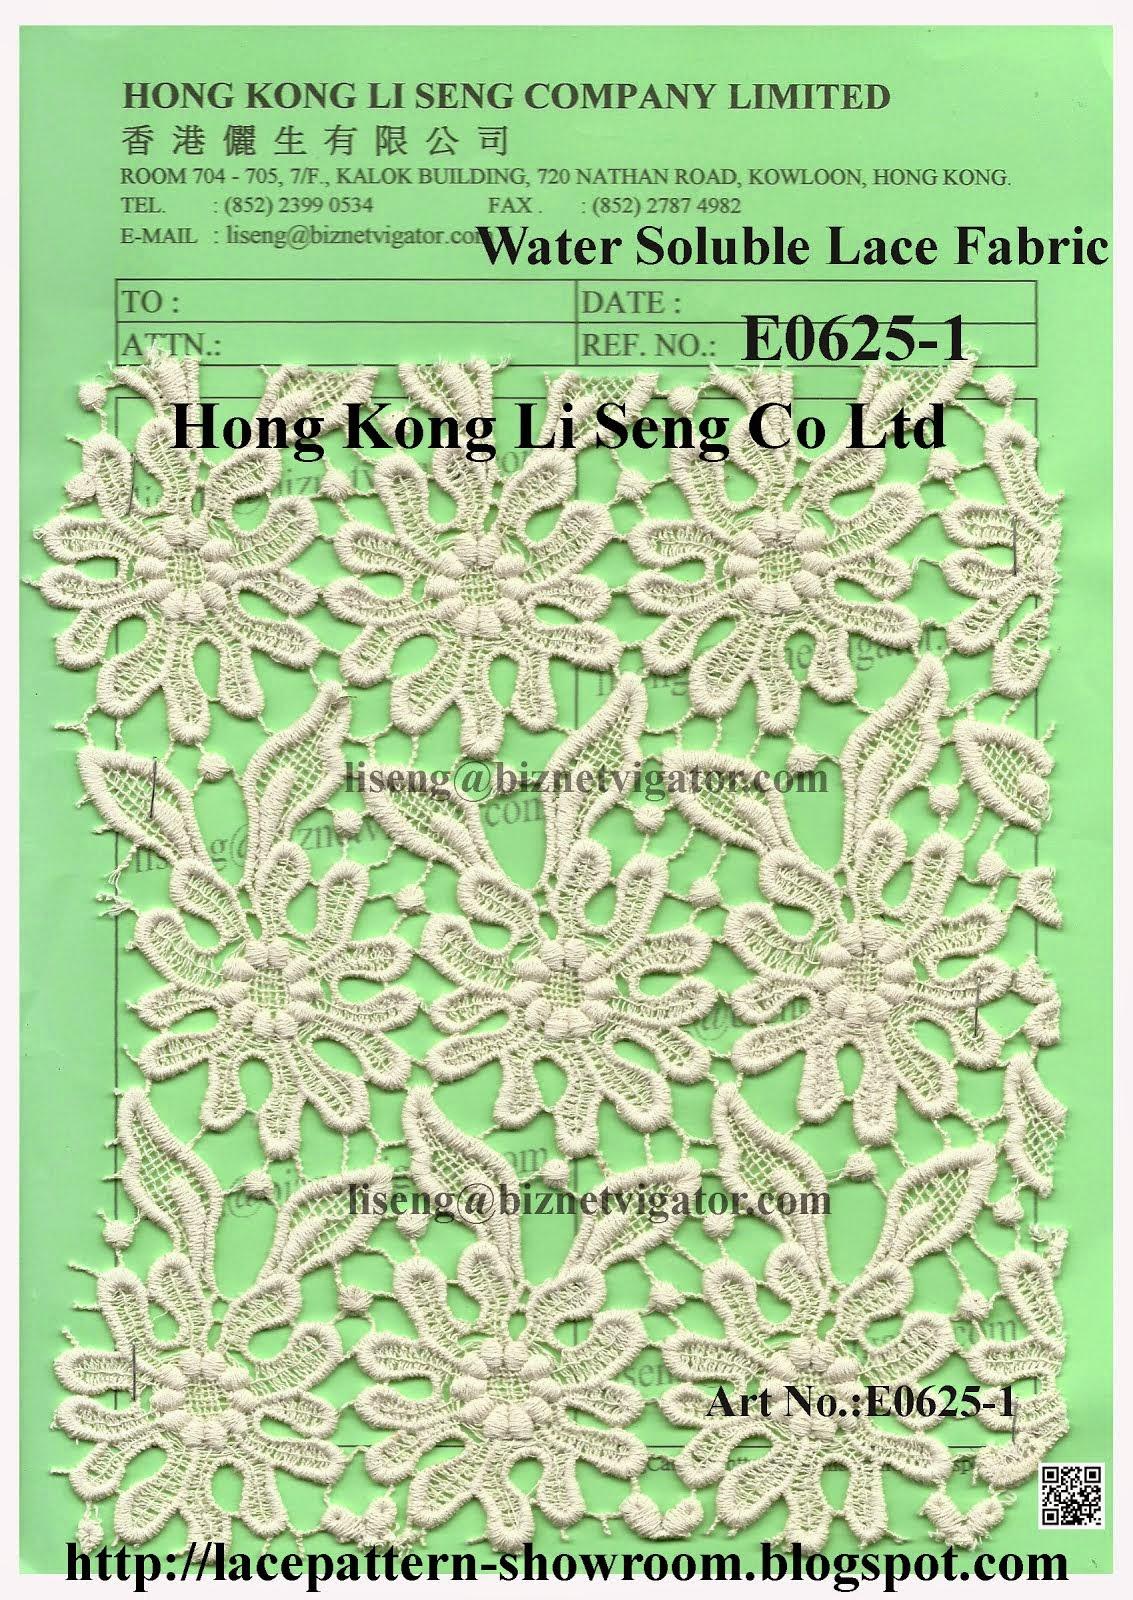 Lace fabric Trim, lace fabric wholesale, lace fabric by the yard, lace fabric for sale, lace fabric